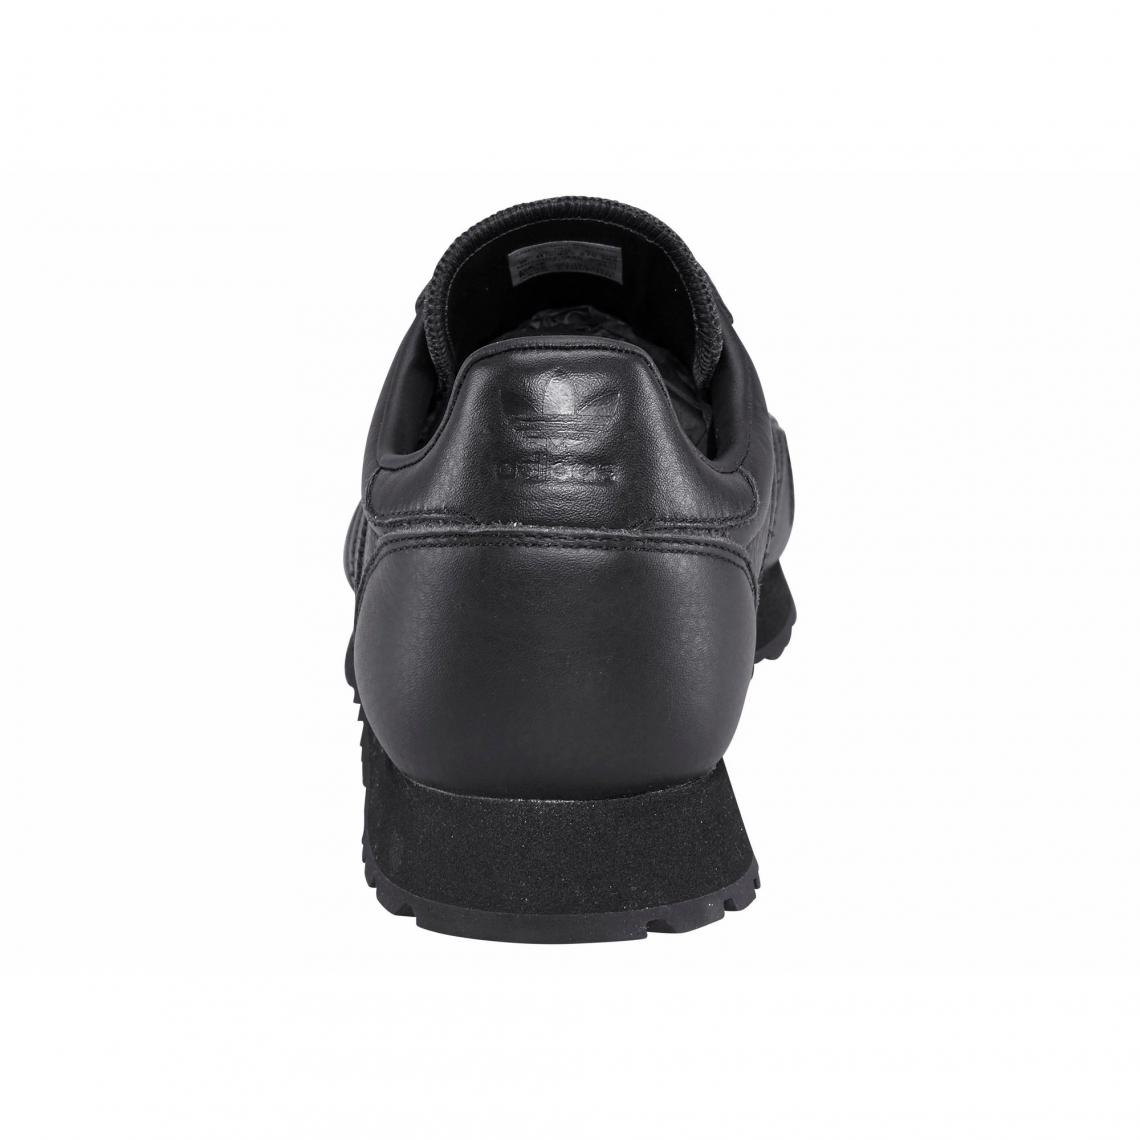 sports shoes 5e534 3cc66 adidas Originals Haven sneakers homme - Noir Adidas Originals